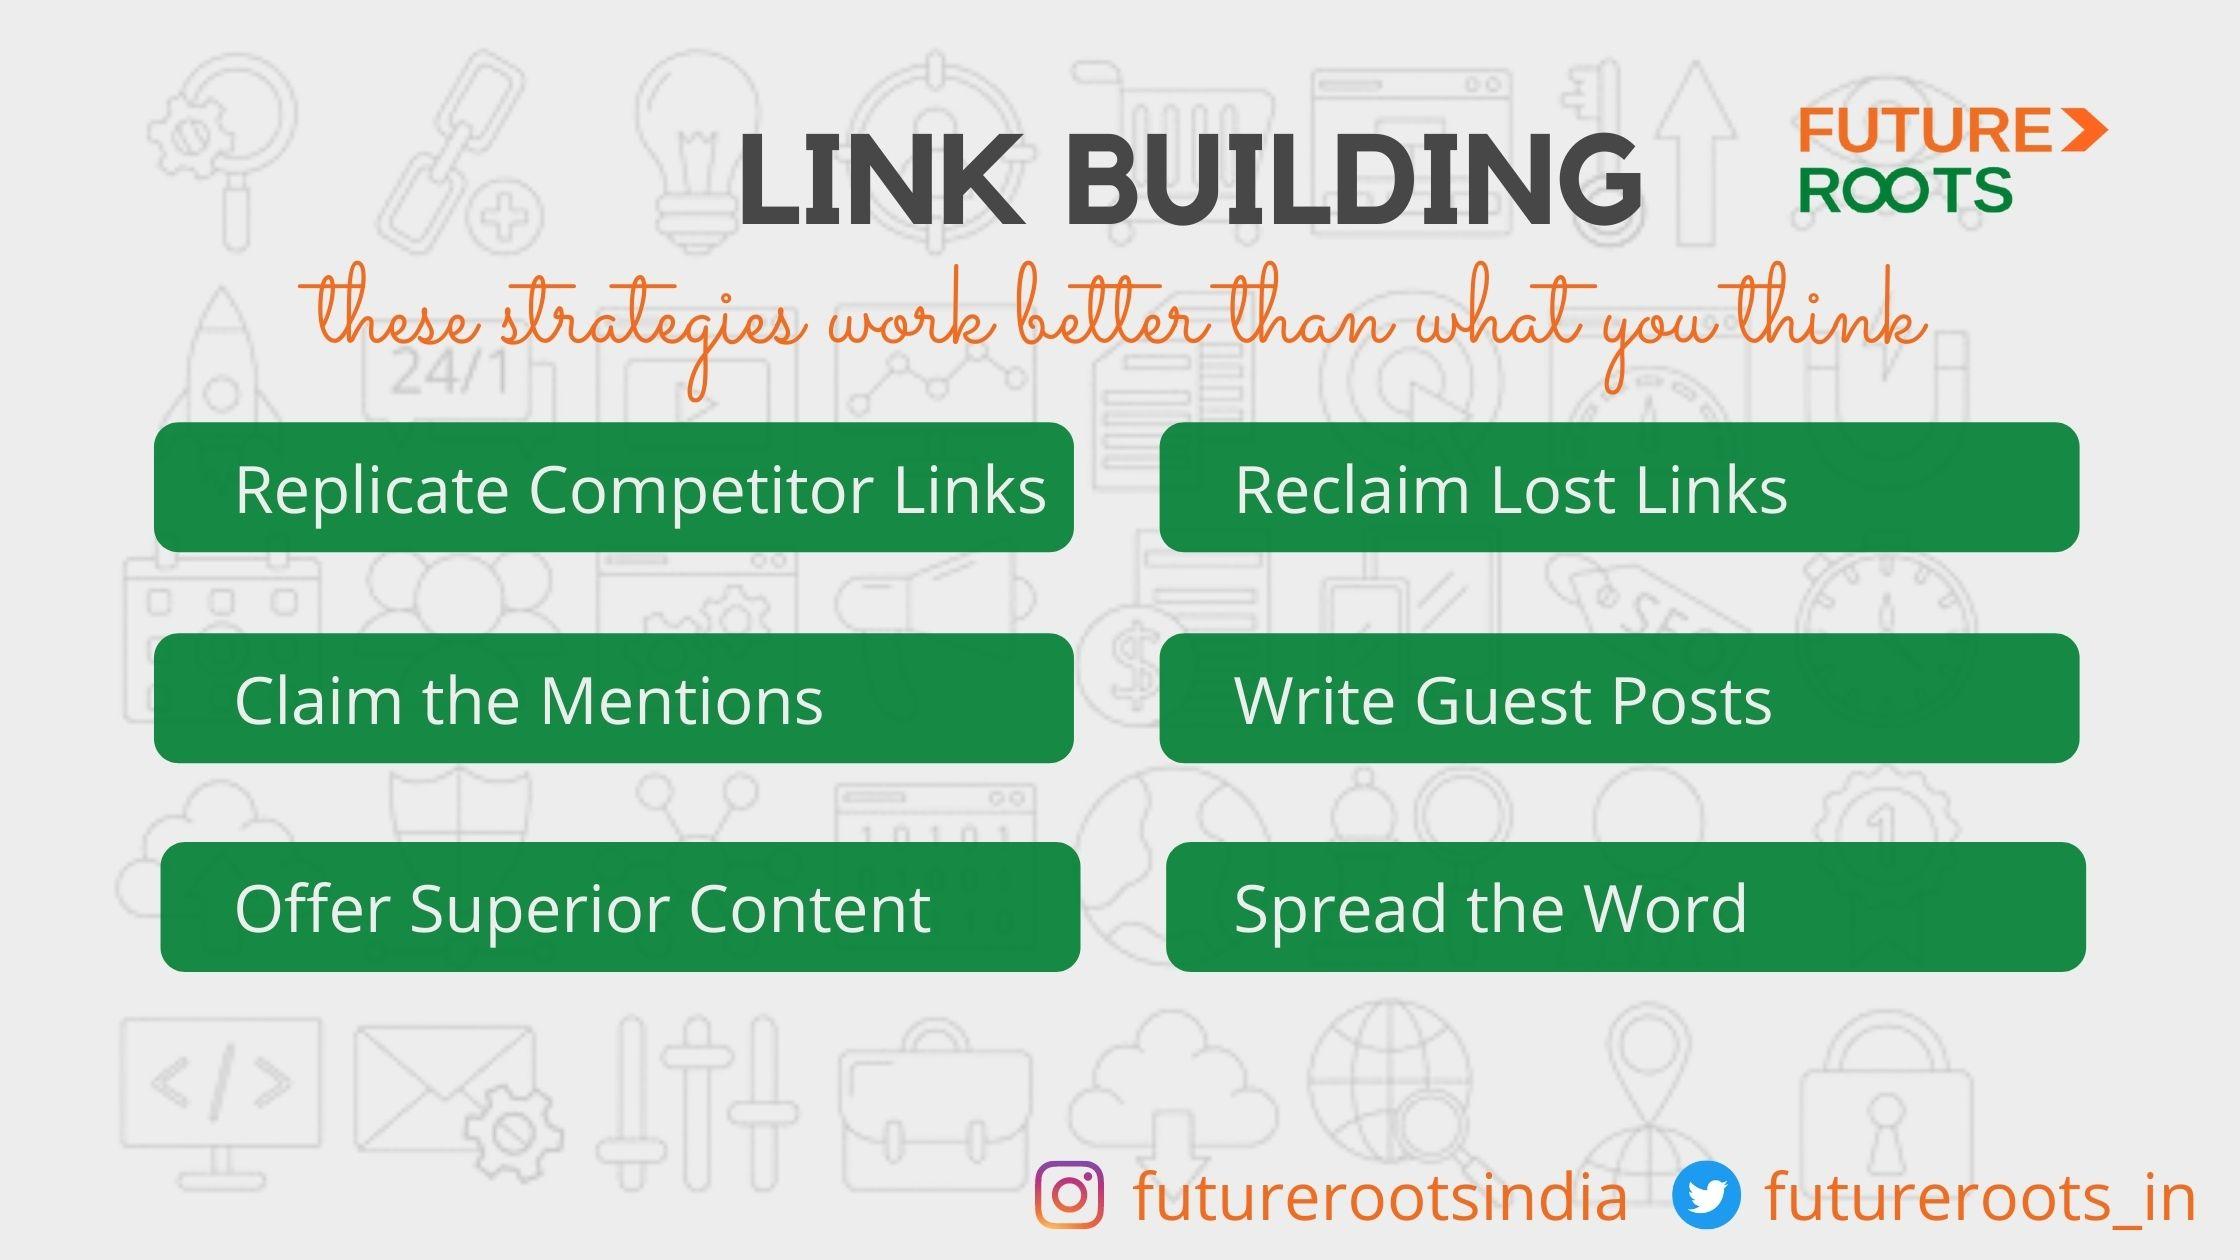 Seo tips - link building strategies